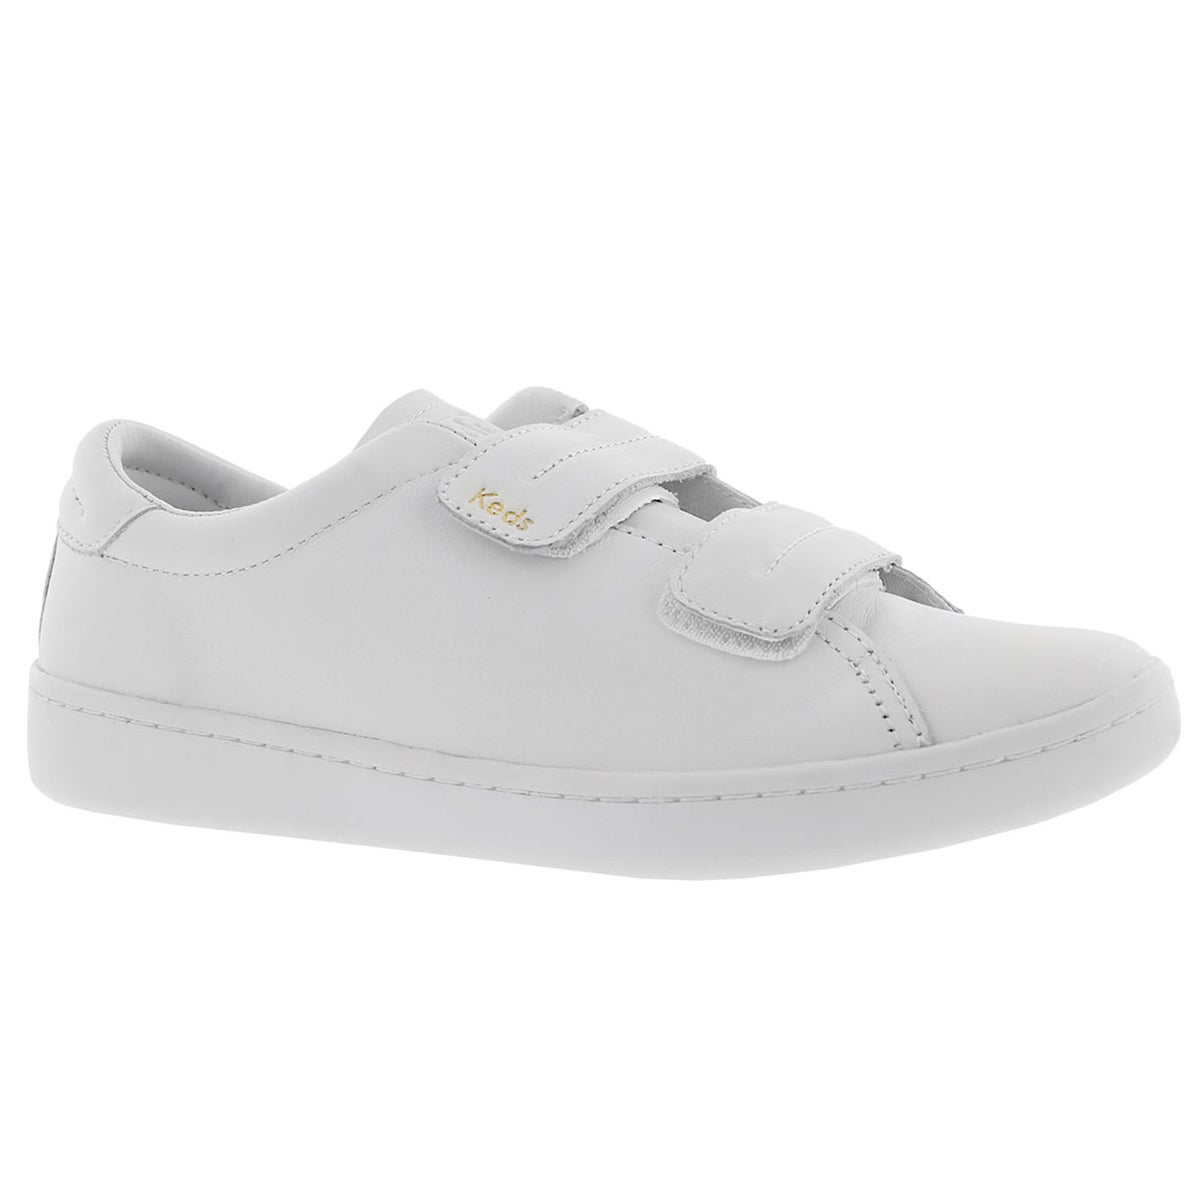 Women's ACE white hook & loop leather sneakers